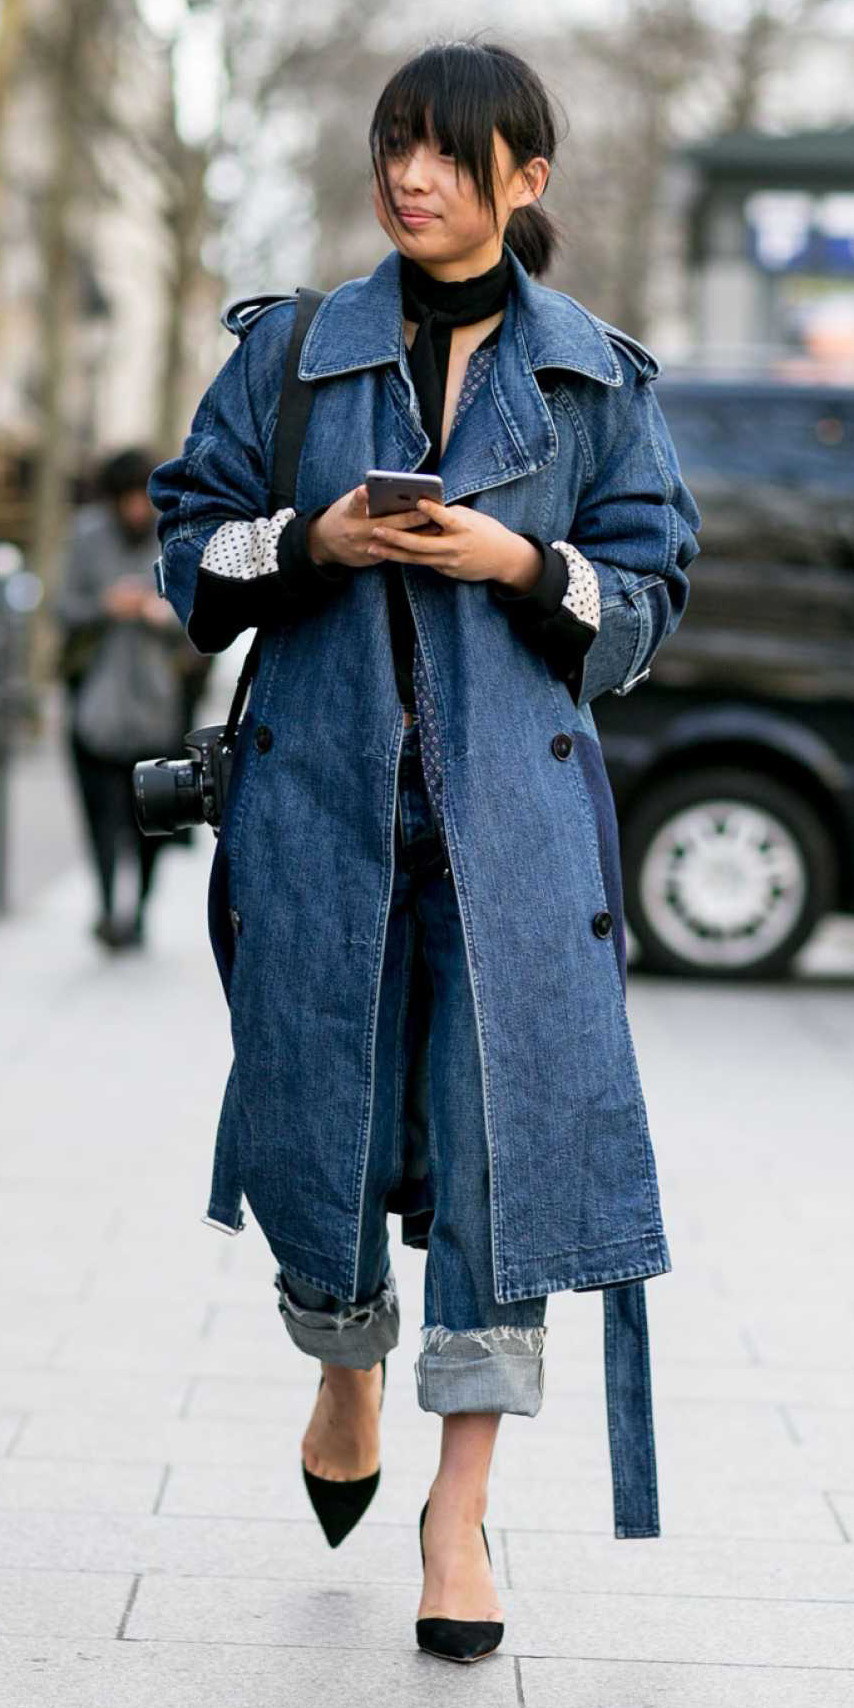 black-shoe-pumps-pony-brun-denim-blue-med-jacket-coat-trench-fall-winter-lunch.jpg